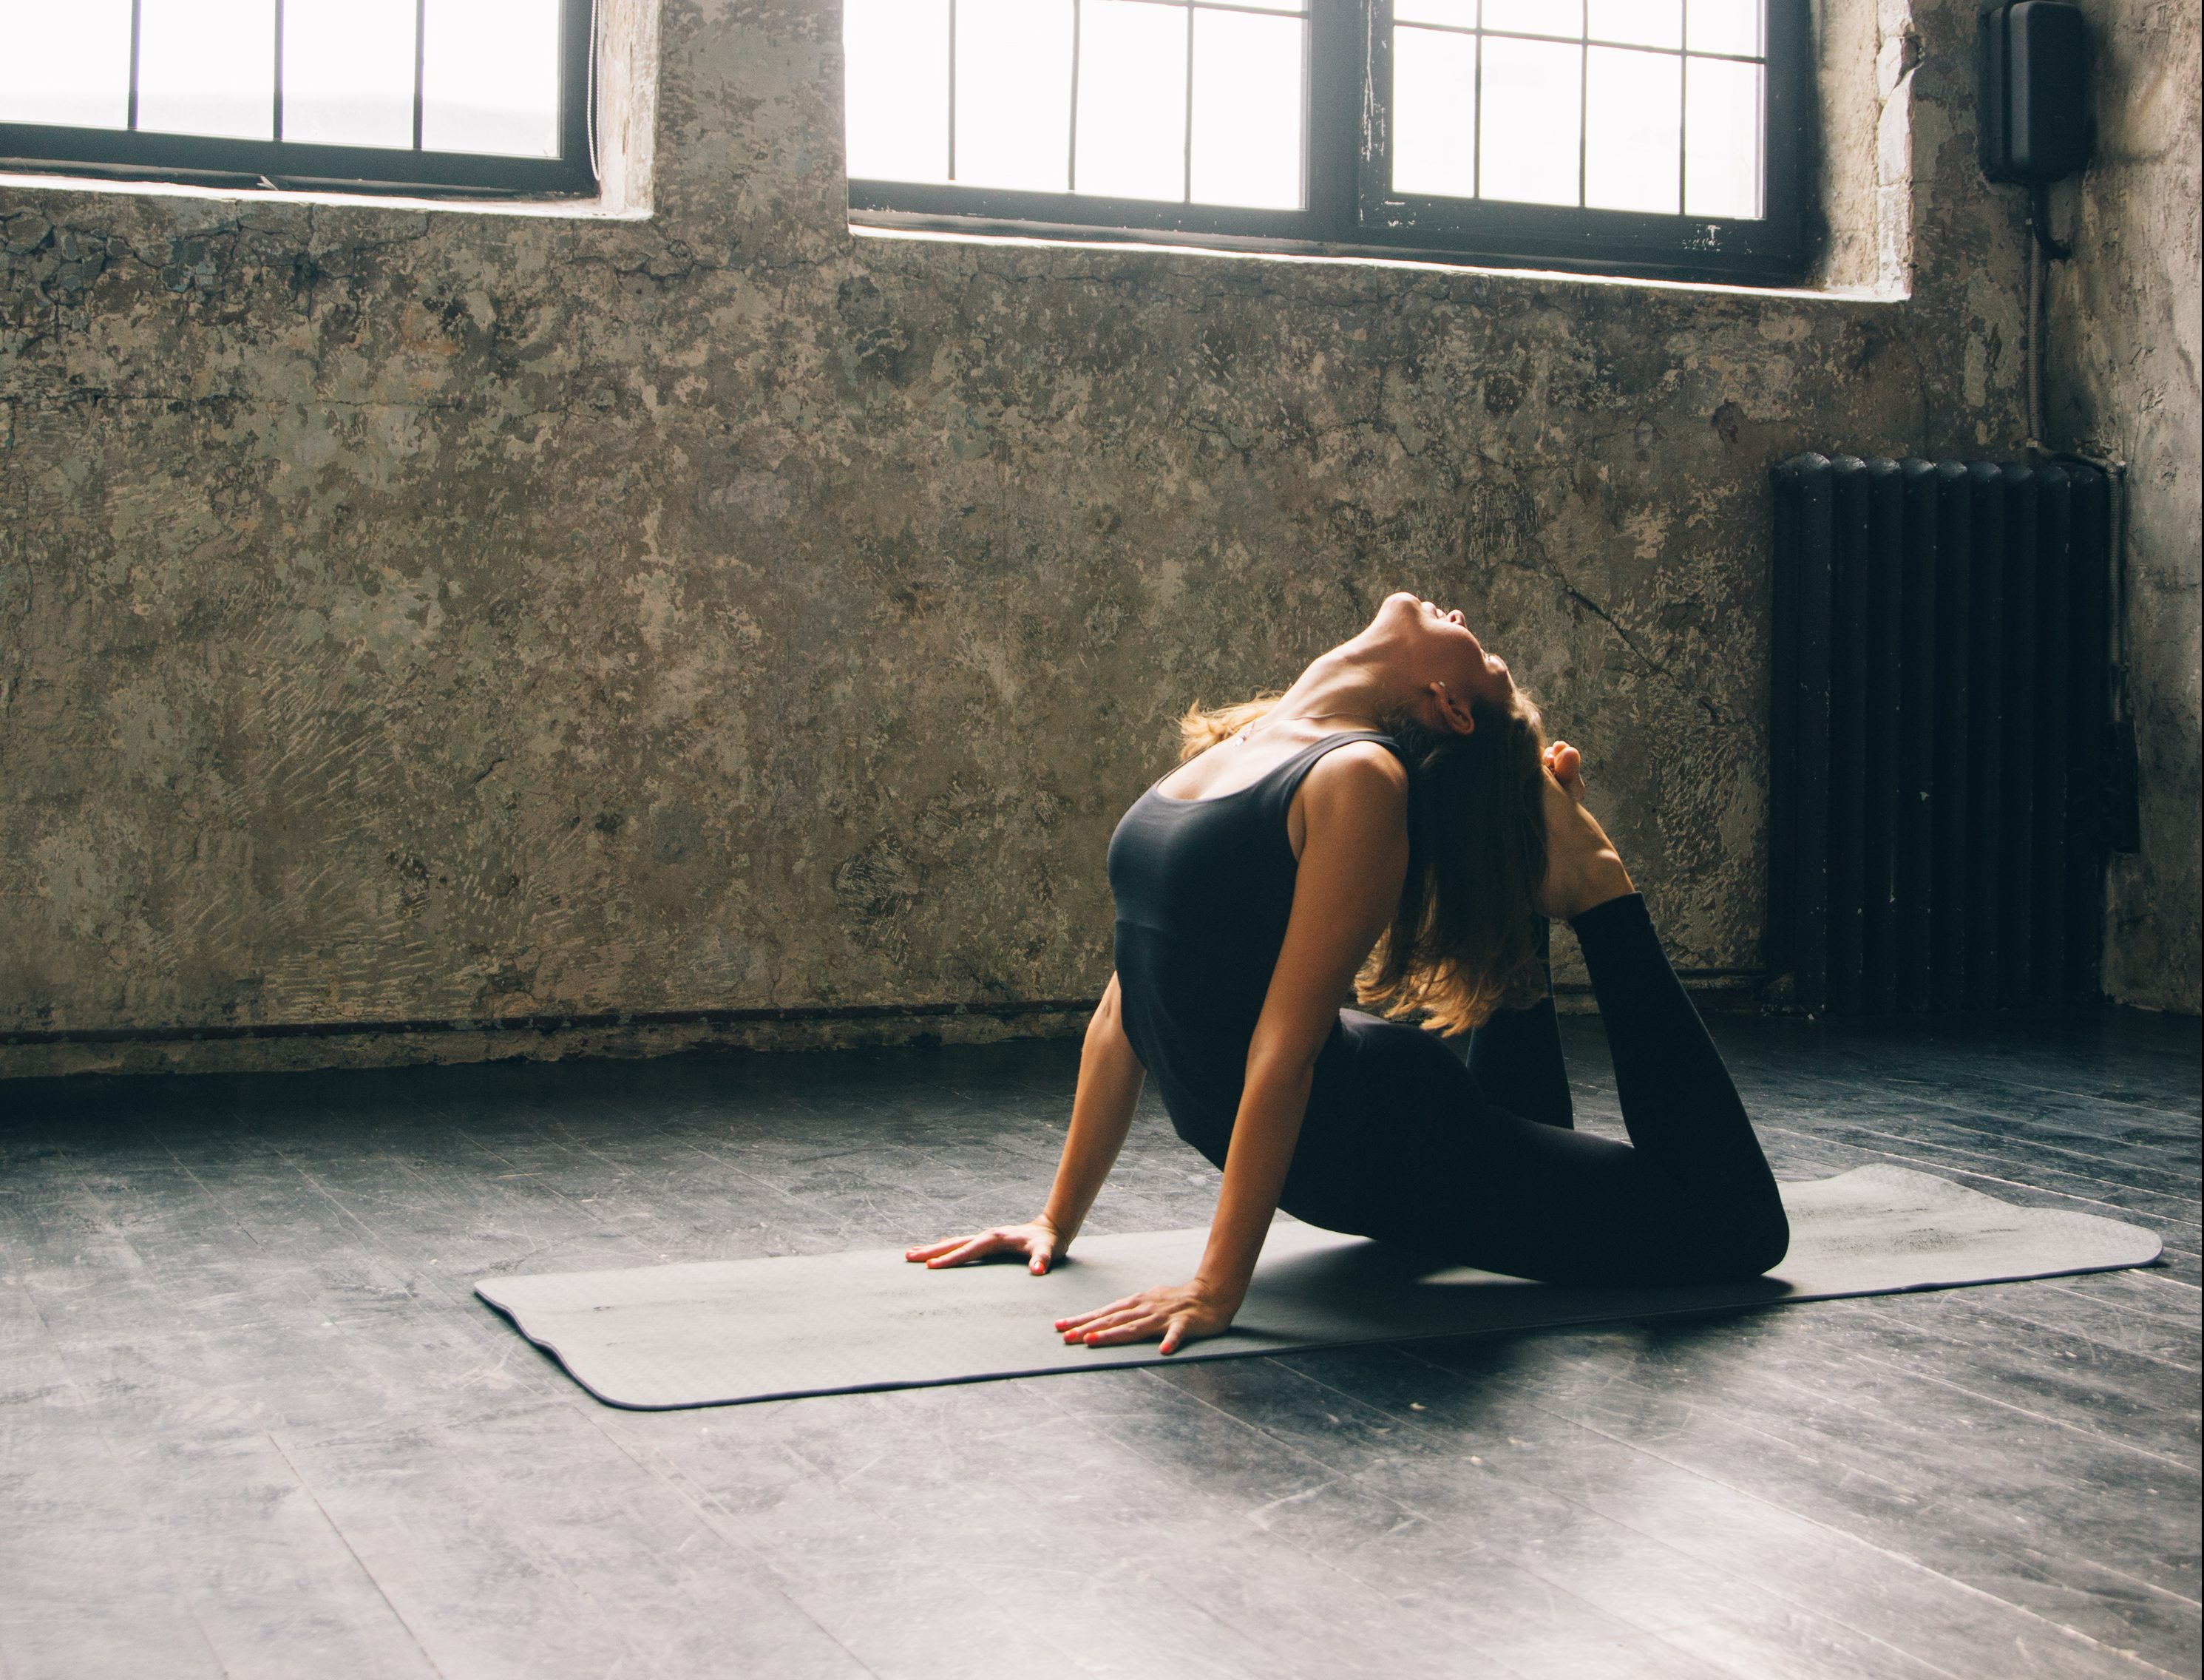 Young woman practicing yoga in urban loft: Cobra Pose (Bhujangasana)